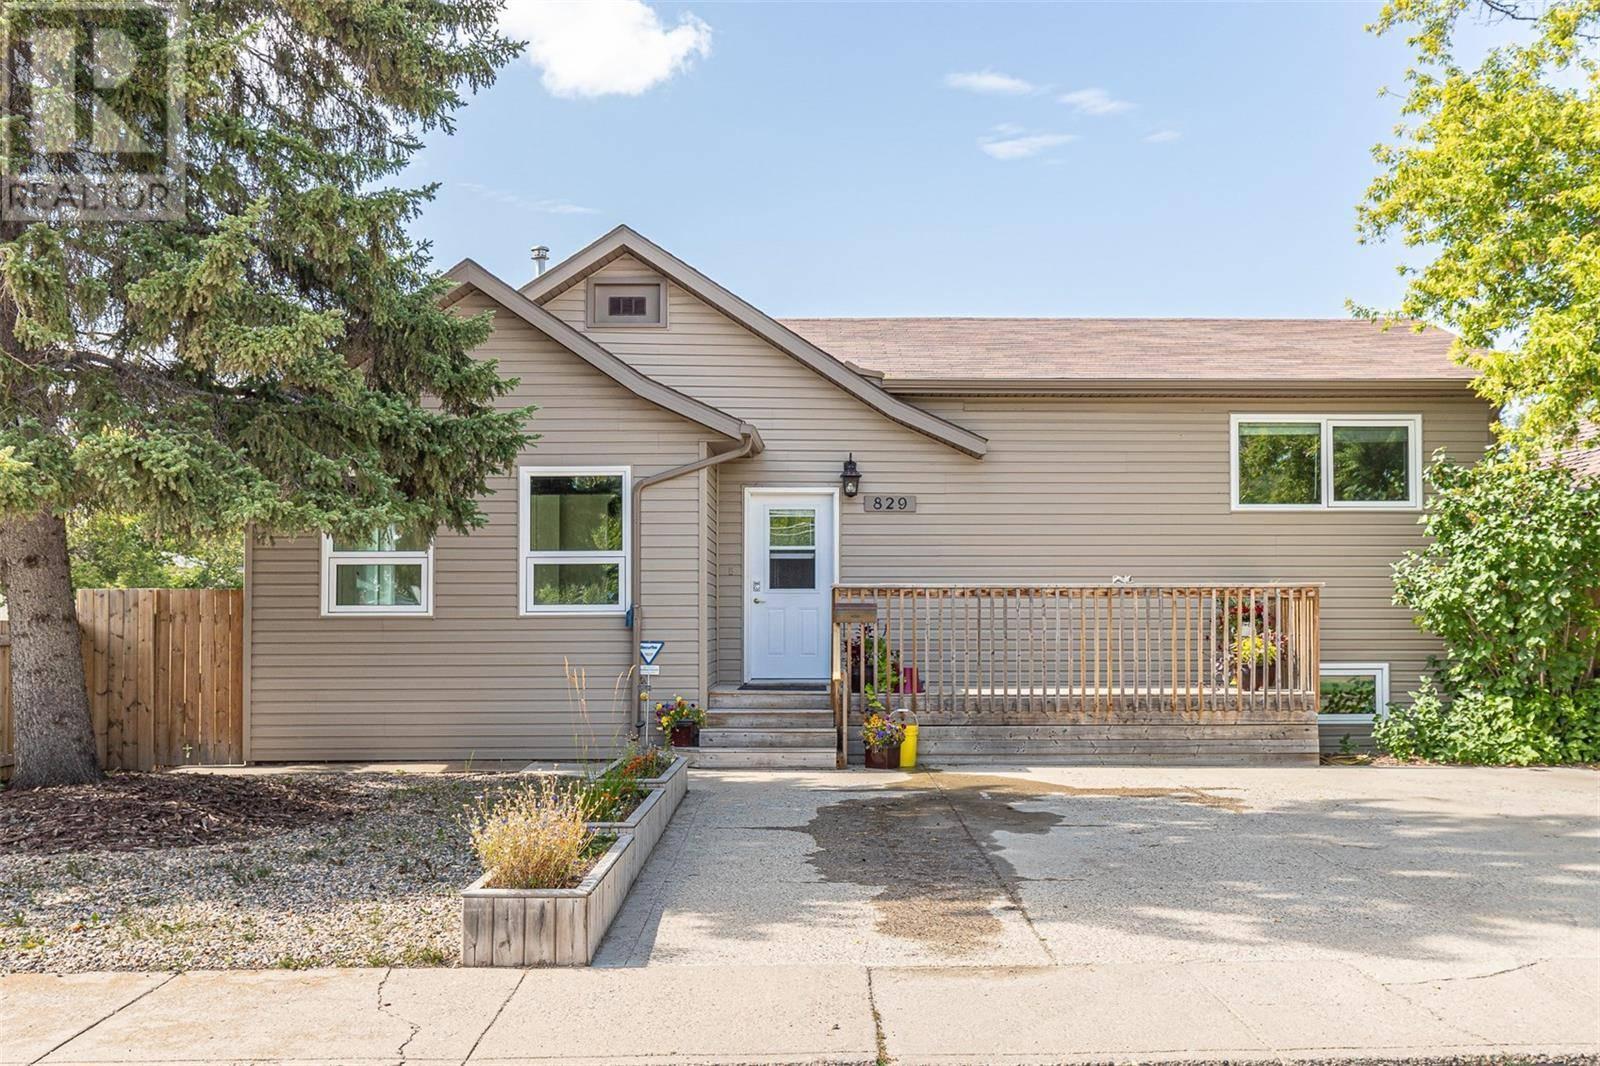 House for sale at 829 N Ave S Saskatoon Saskatchewan - MLS: SK783703